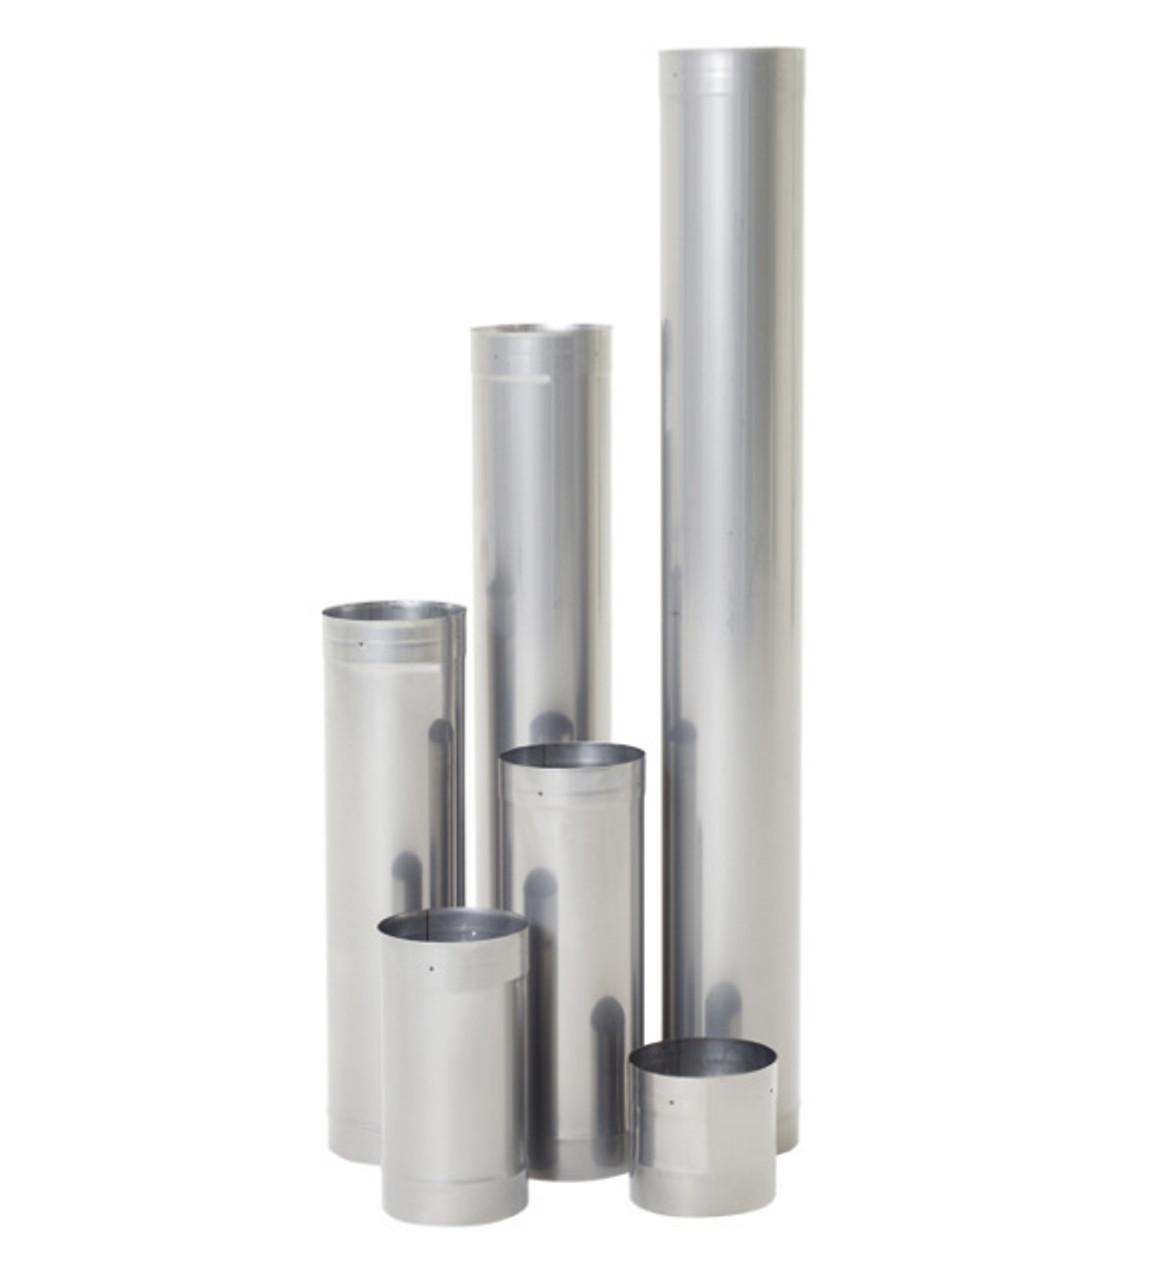 "Rhino Rigid Chimney Liner 304L Stainless - 8"" diameter"